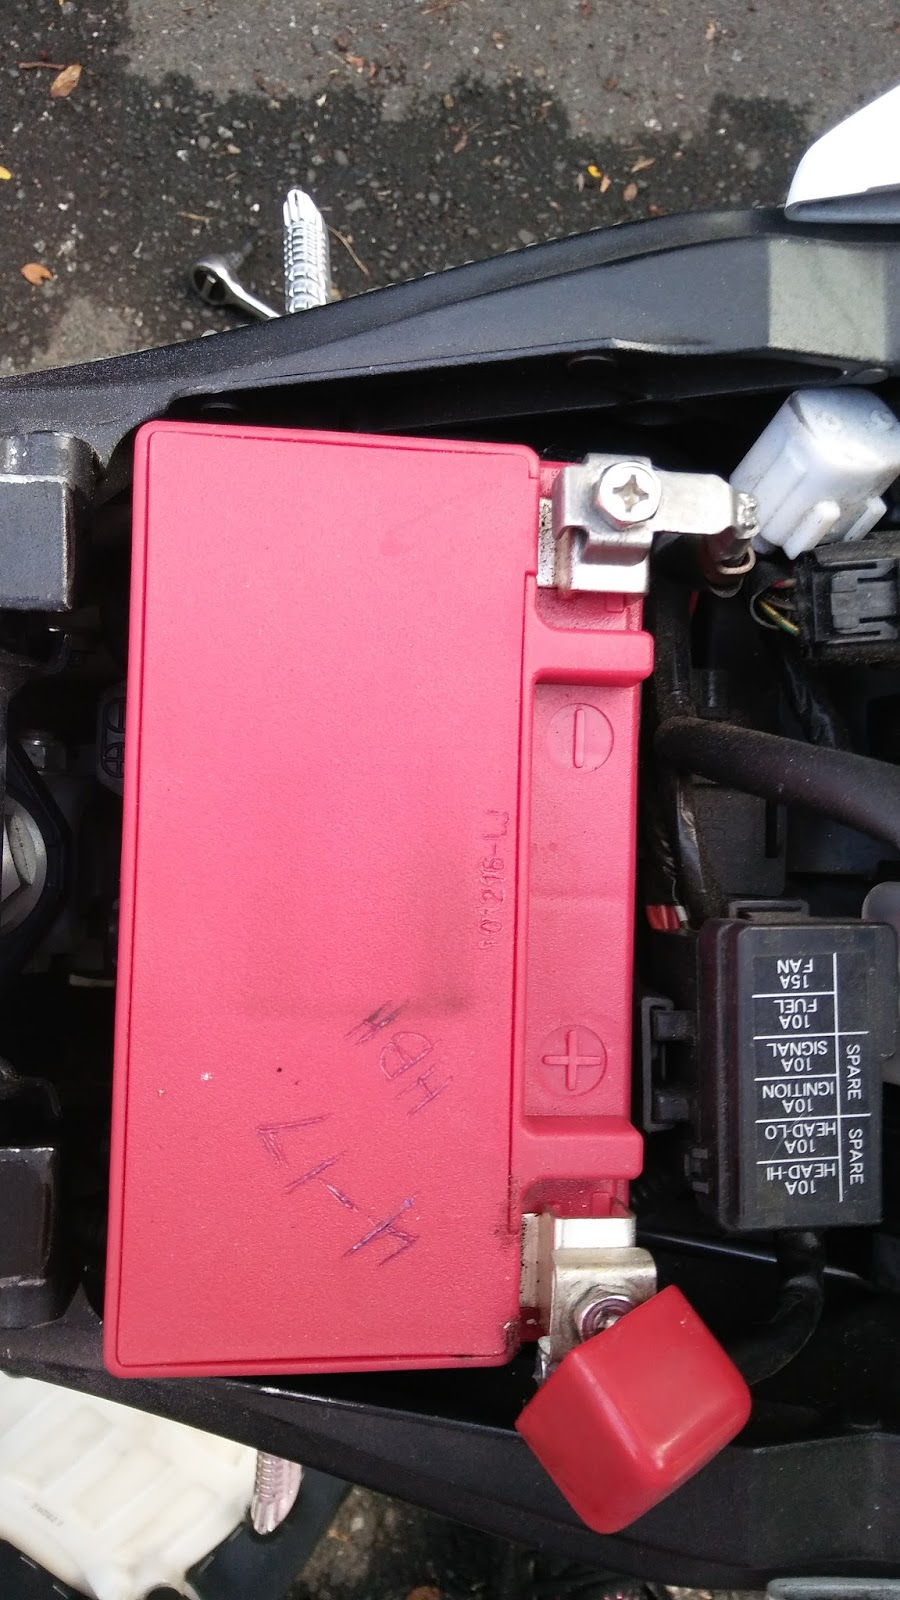 2011 Suzuki Gsxr 600 Clicking noise = Fi / F1 code C28 Secondary